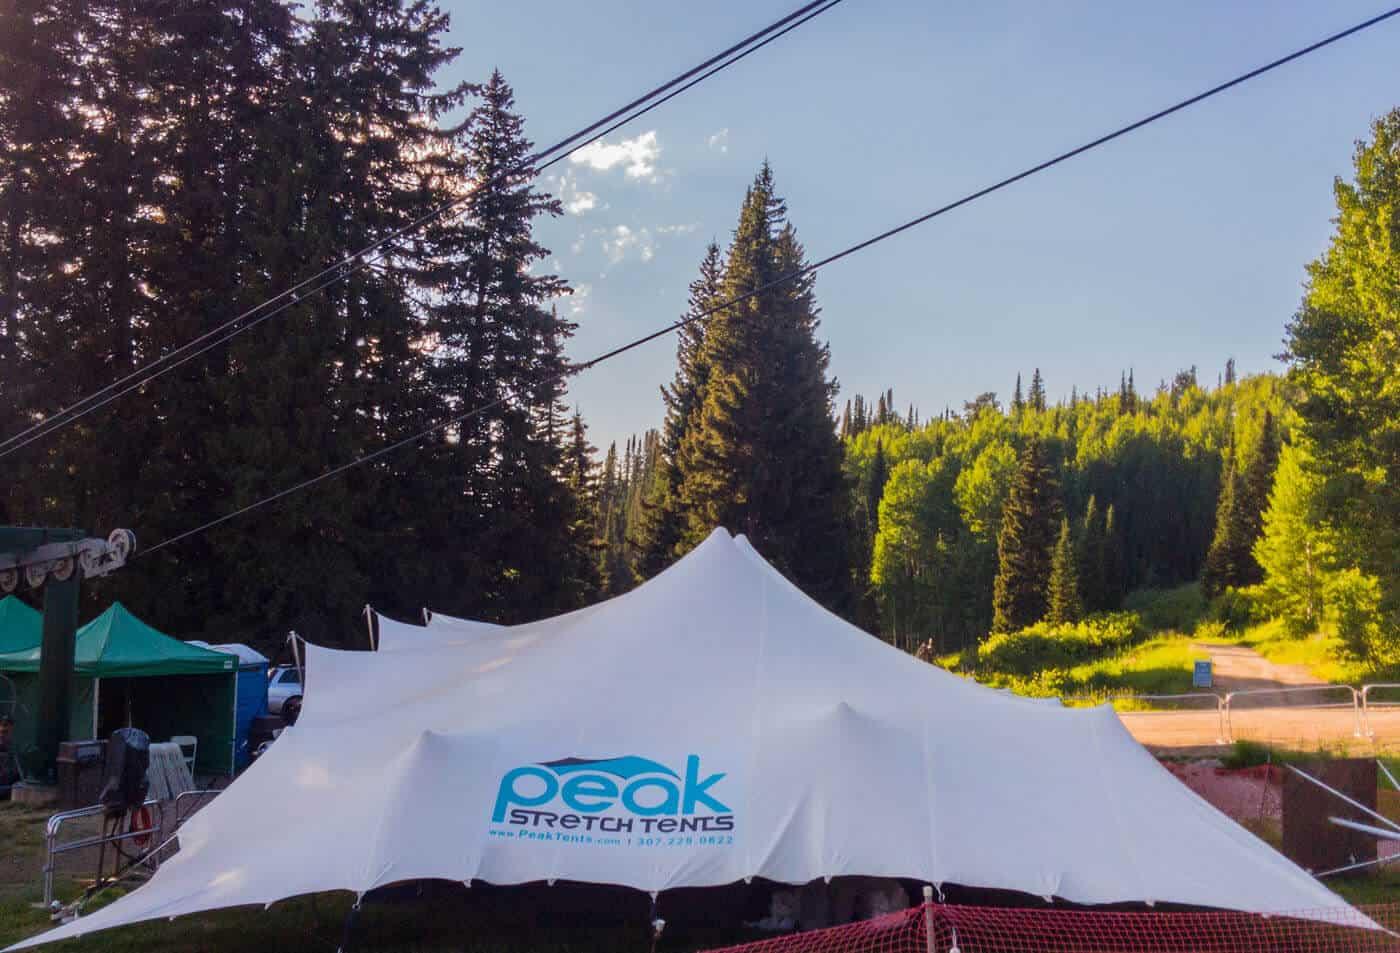 OLYMPUS DIGITAL CAMERA & Jackson Hole Wedding u0026 Event Tent Rentals u0026 Sales